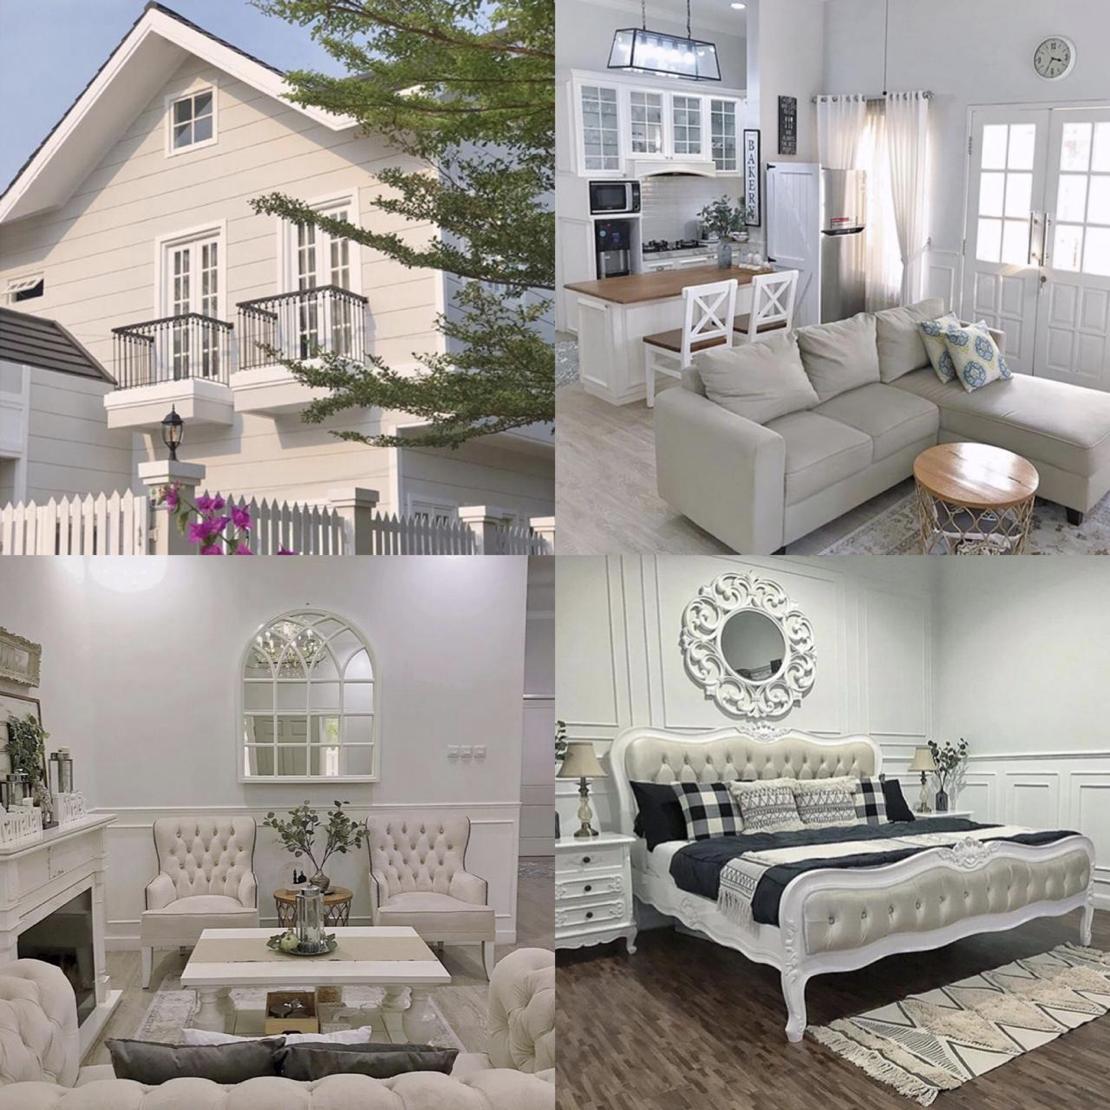 Desain Interior Rumah American Style Ala Natalie Sarah - souce: instagram.com/natalie_sarahs